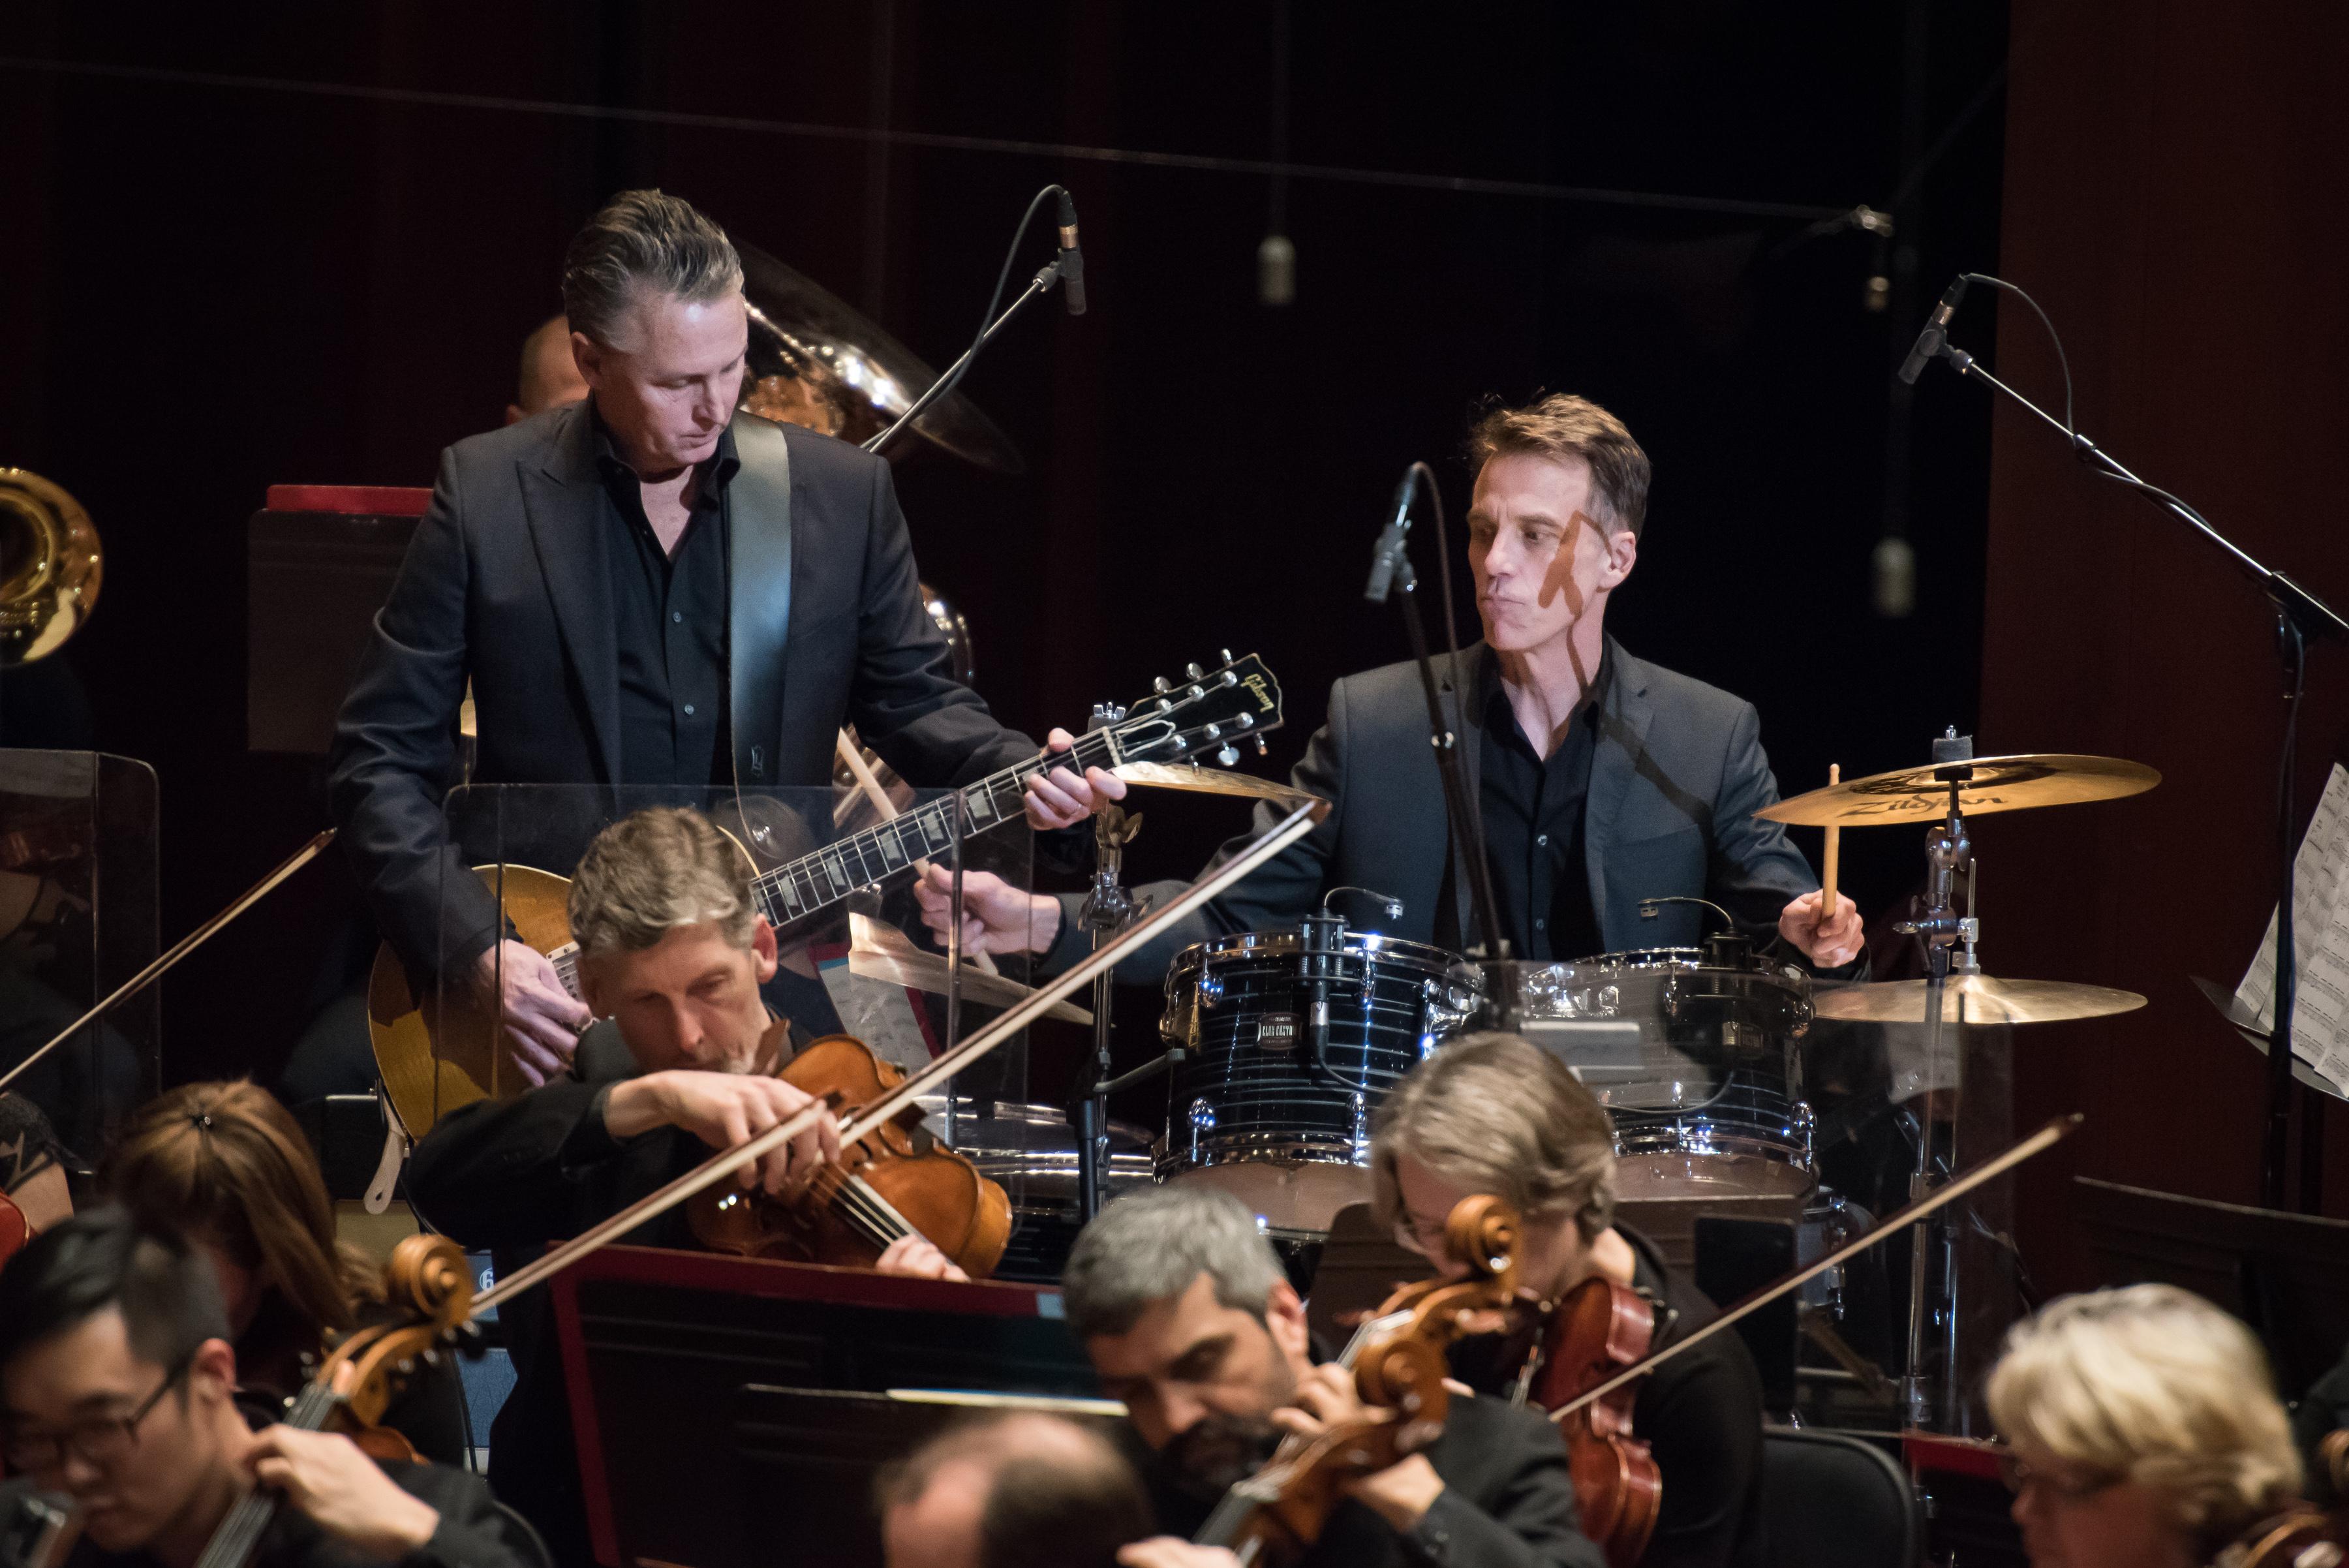 Seattle Symphony, Mike McCready & Mad Season at Benaroya Hall (Photo by Brandon Patoc)